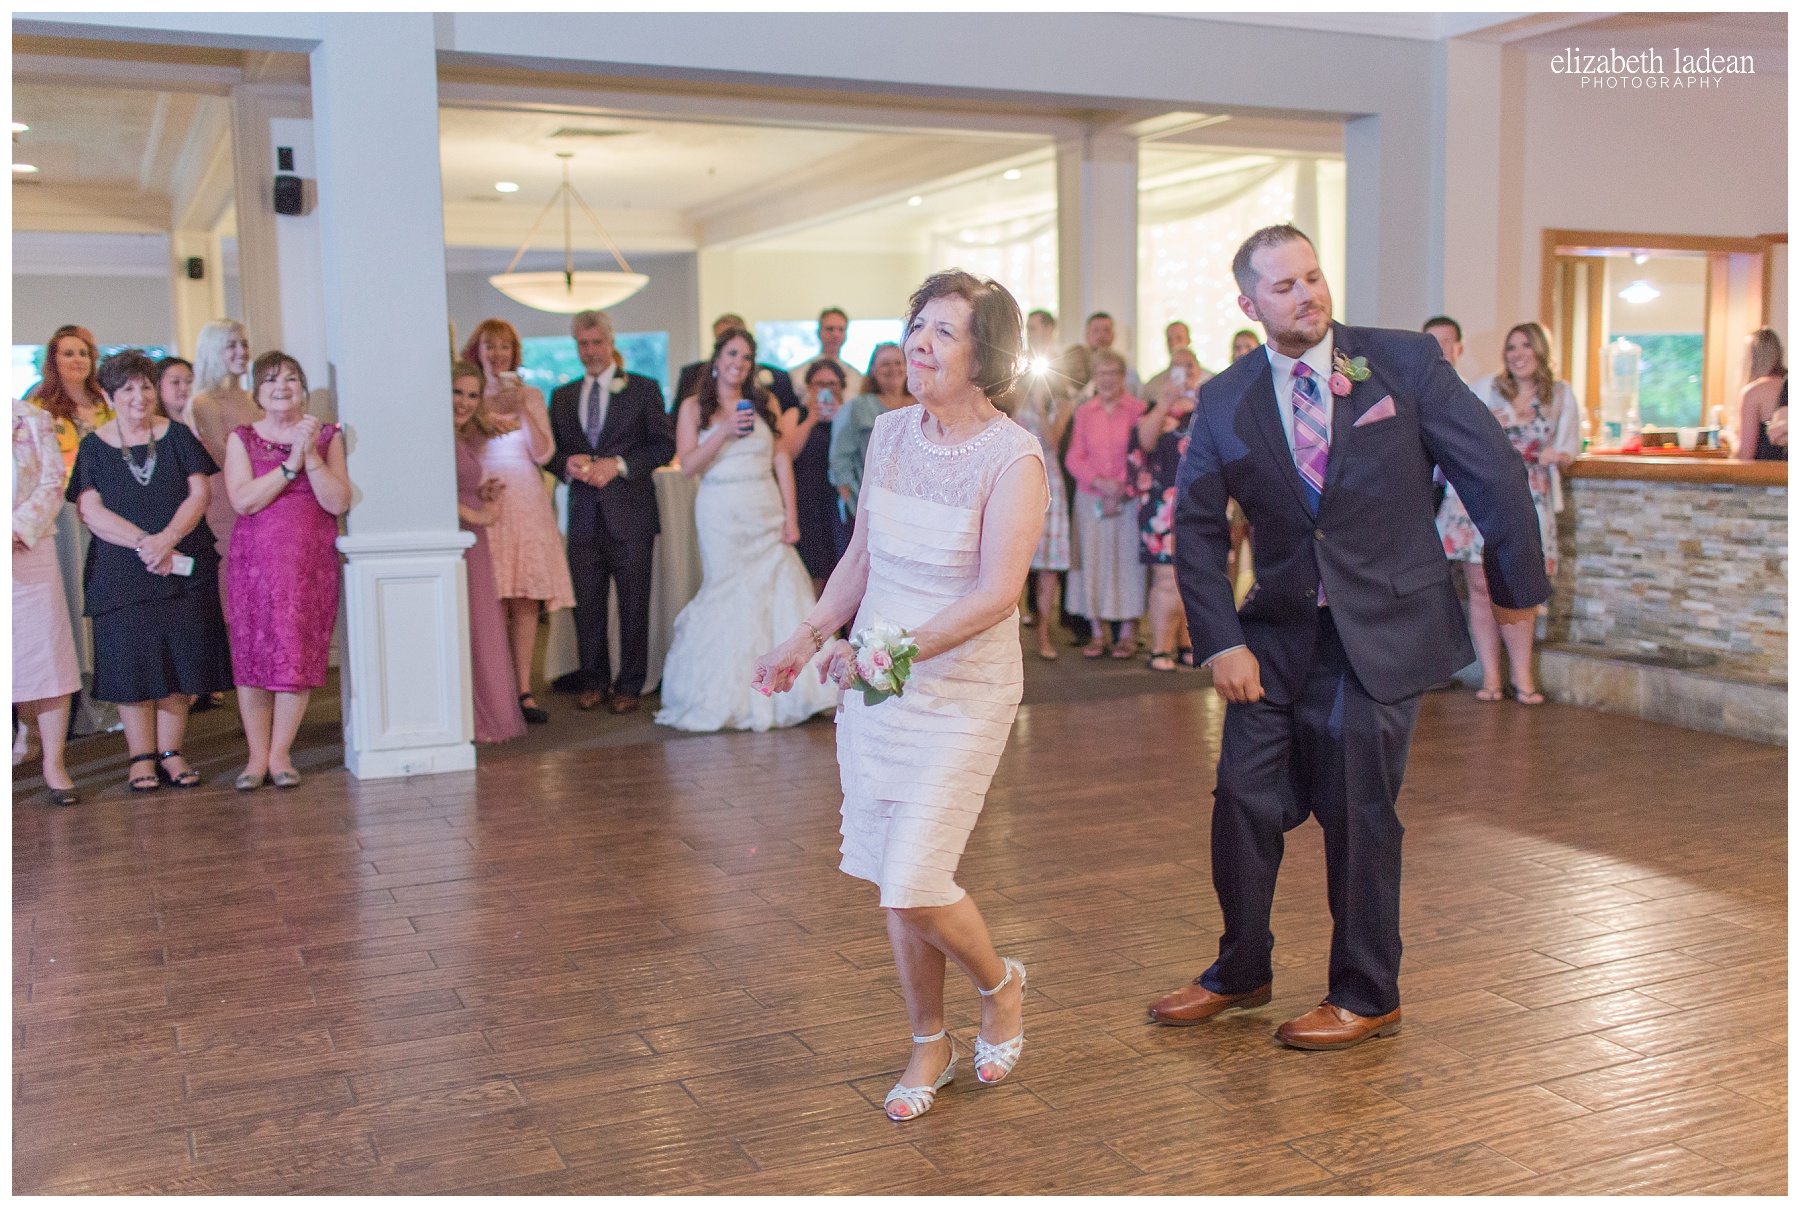 Hillcrest-Country-Club-Kansas-City-Wedding-Photography-E+J-0520-Elizabeth-Ladean-Photography-photo_0886.jpg